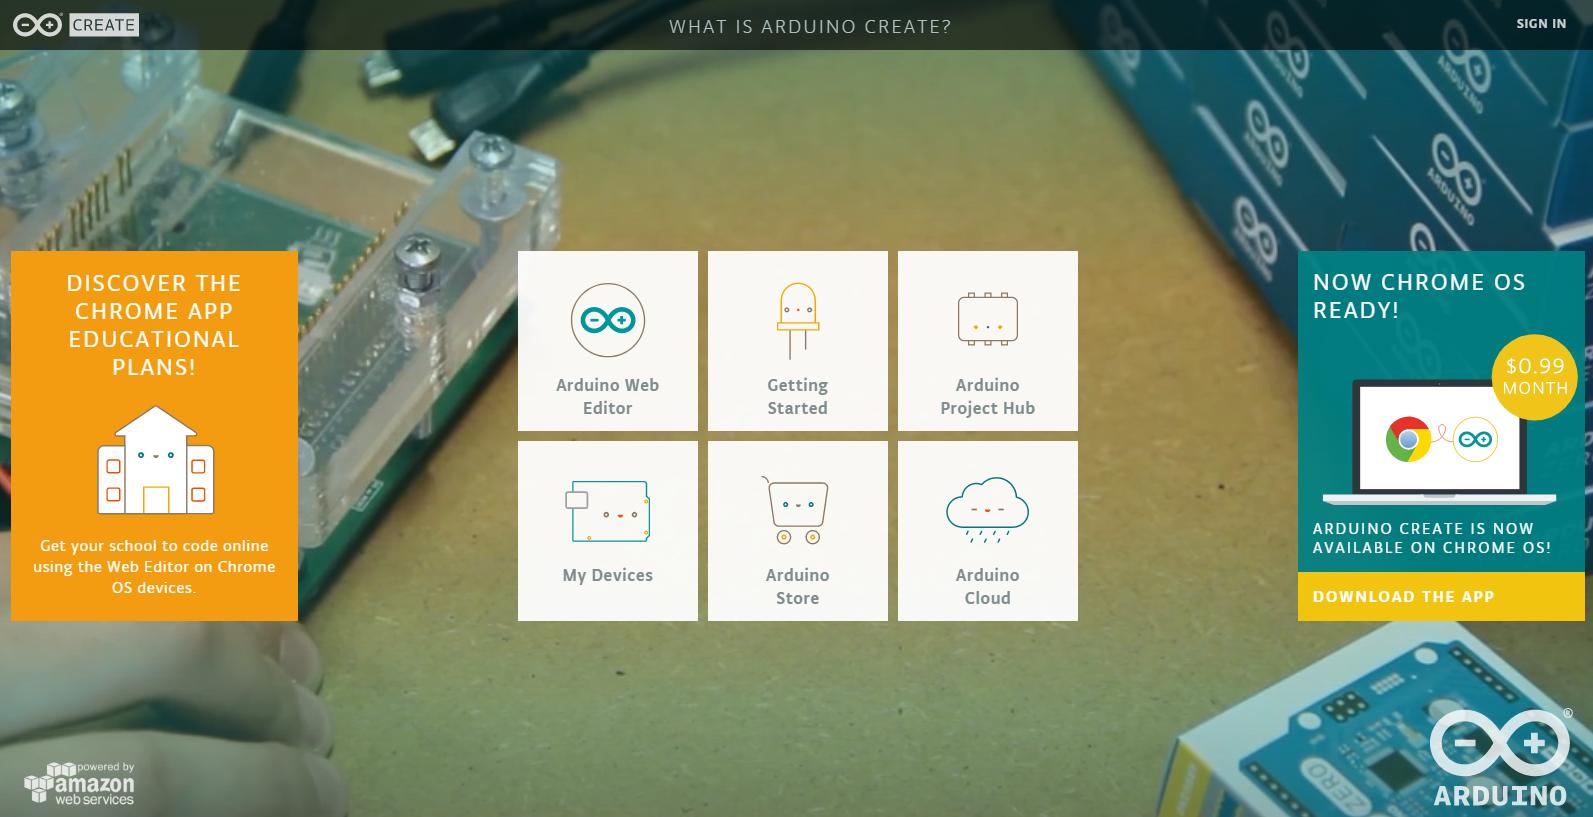 Program Pi, BeagleBone and Other Linux SBCs On The Arduino Create Platform